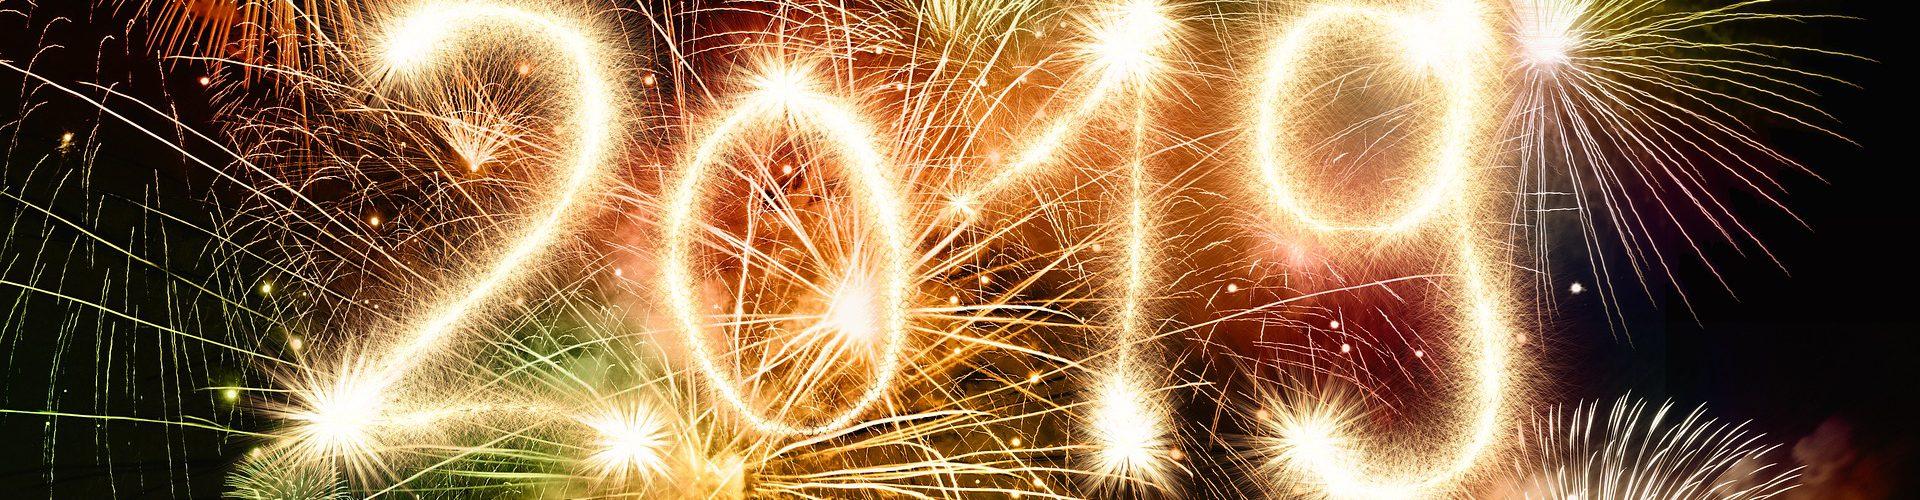 fireworks-3816694_1920